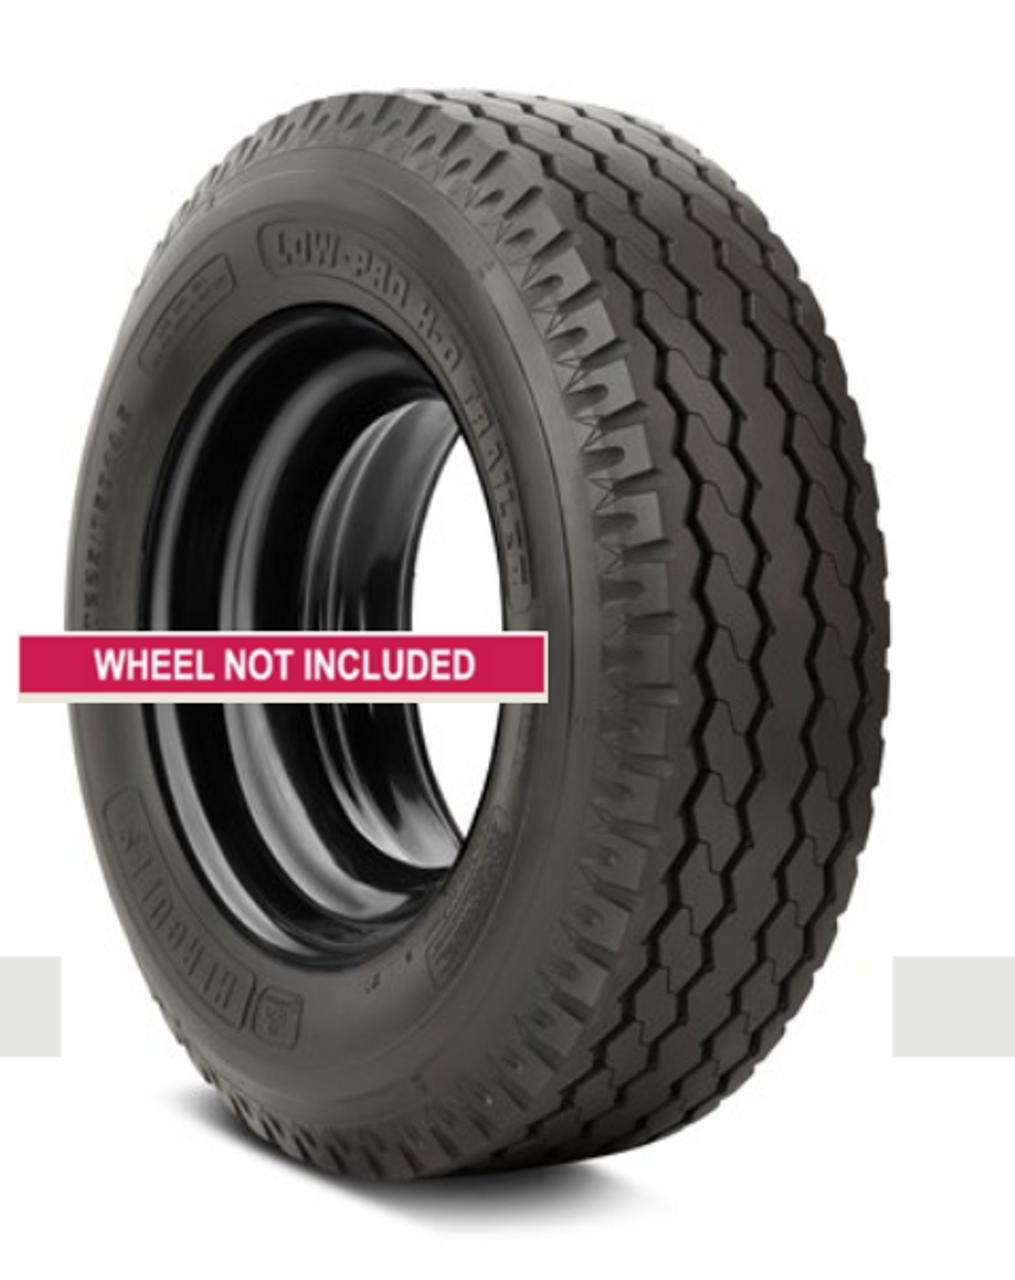 New Tire 205 85 14.5 Hercules Low Boy Trailer 14 ply 8-14.5 ST205/85D14.5